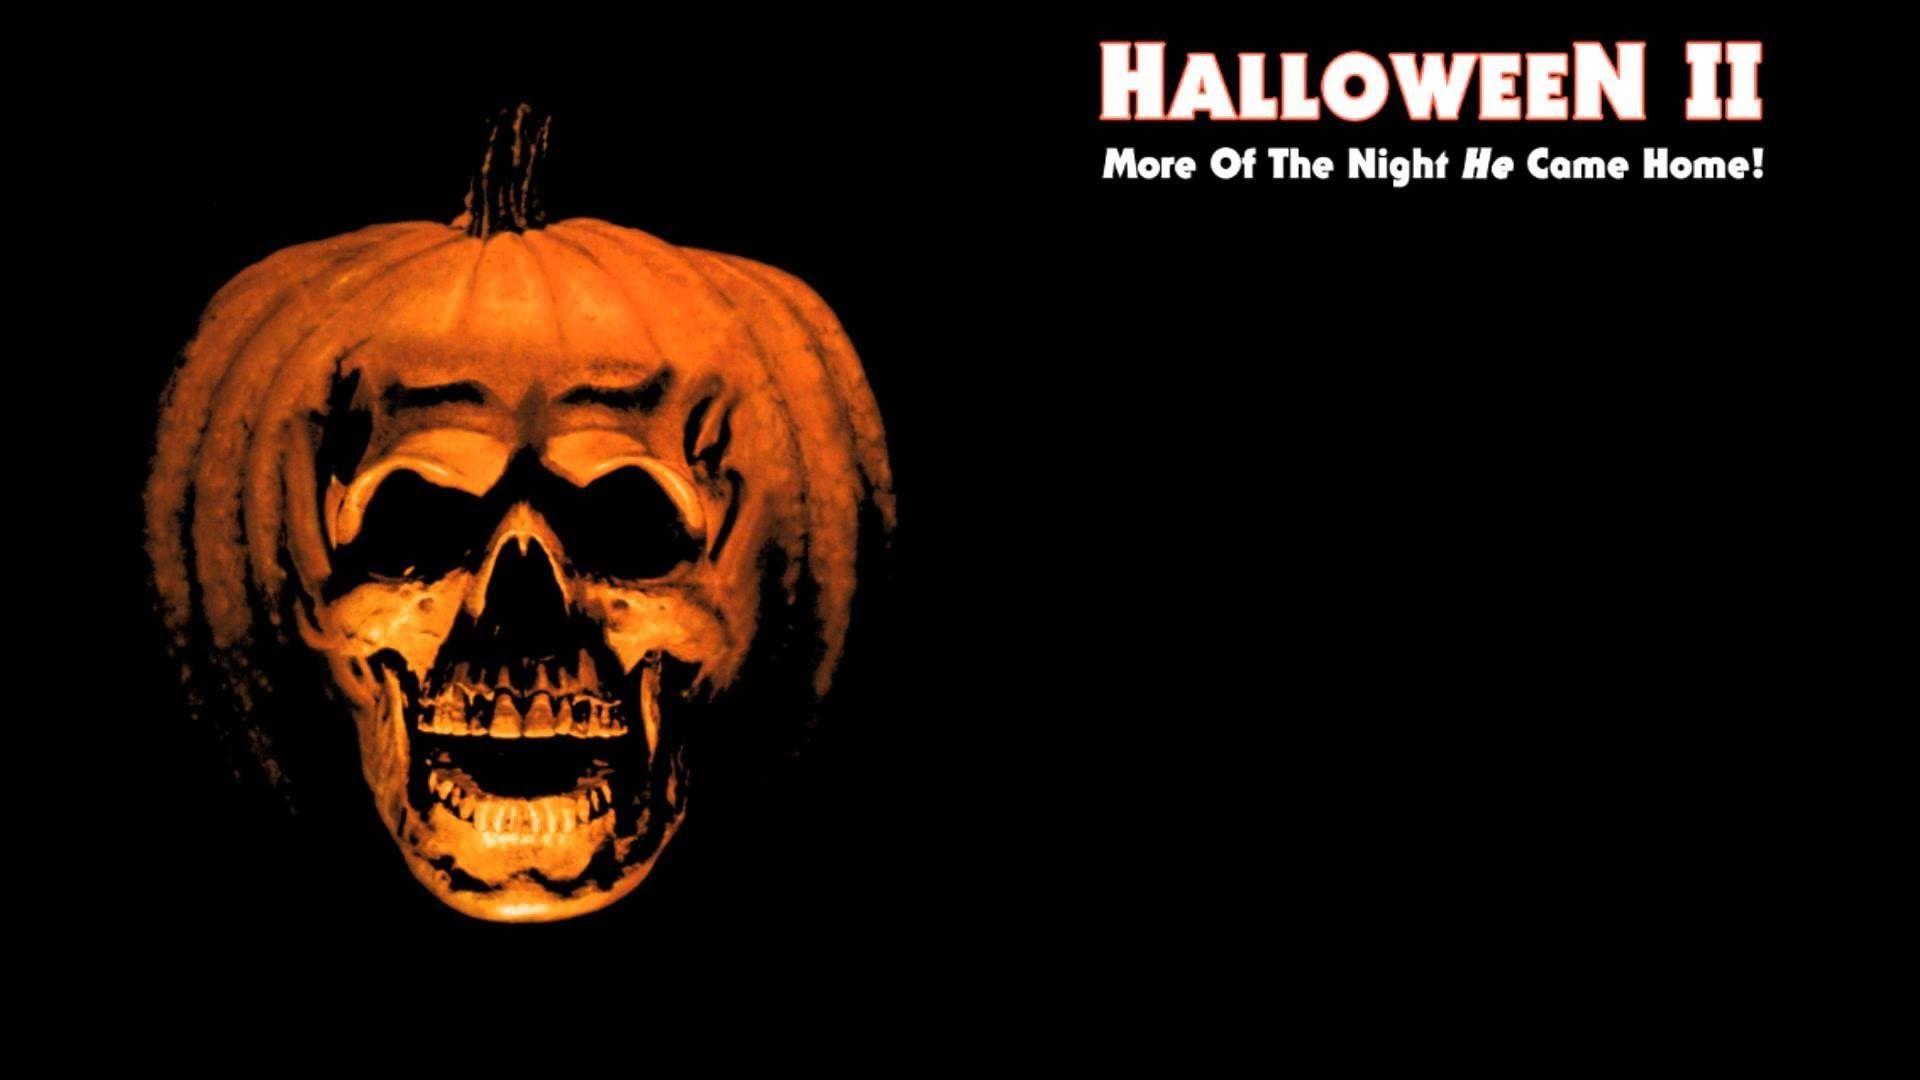 Halloween 2 Wallpapers Group 76 1920x1080